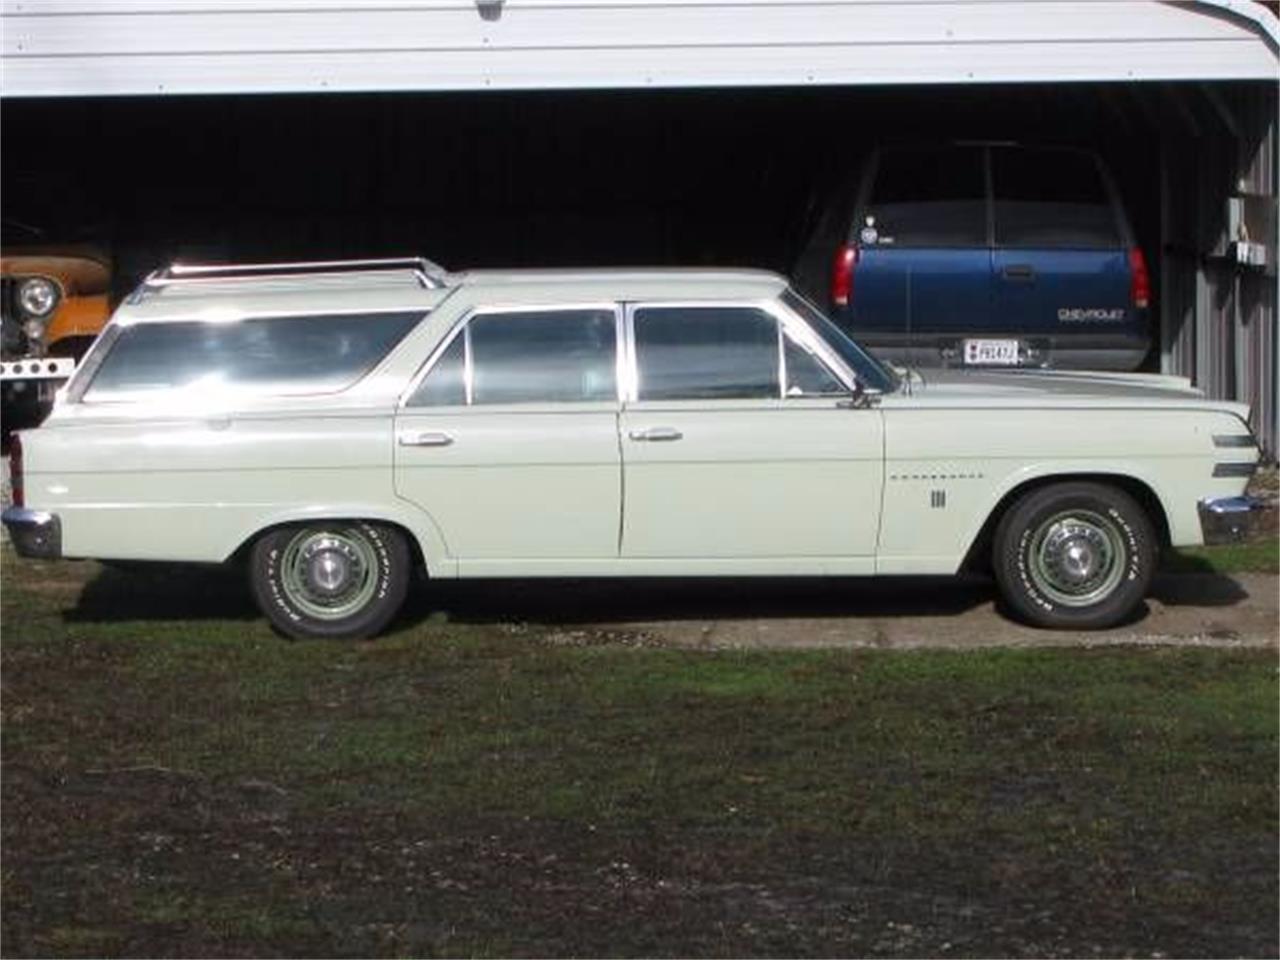 Large Picture of Classic 1966 AMC Ambassador located in Cadillac Michigan - $21,995.00 - O1I4